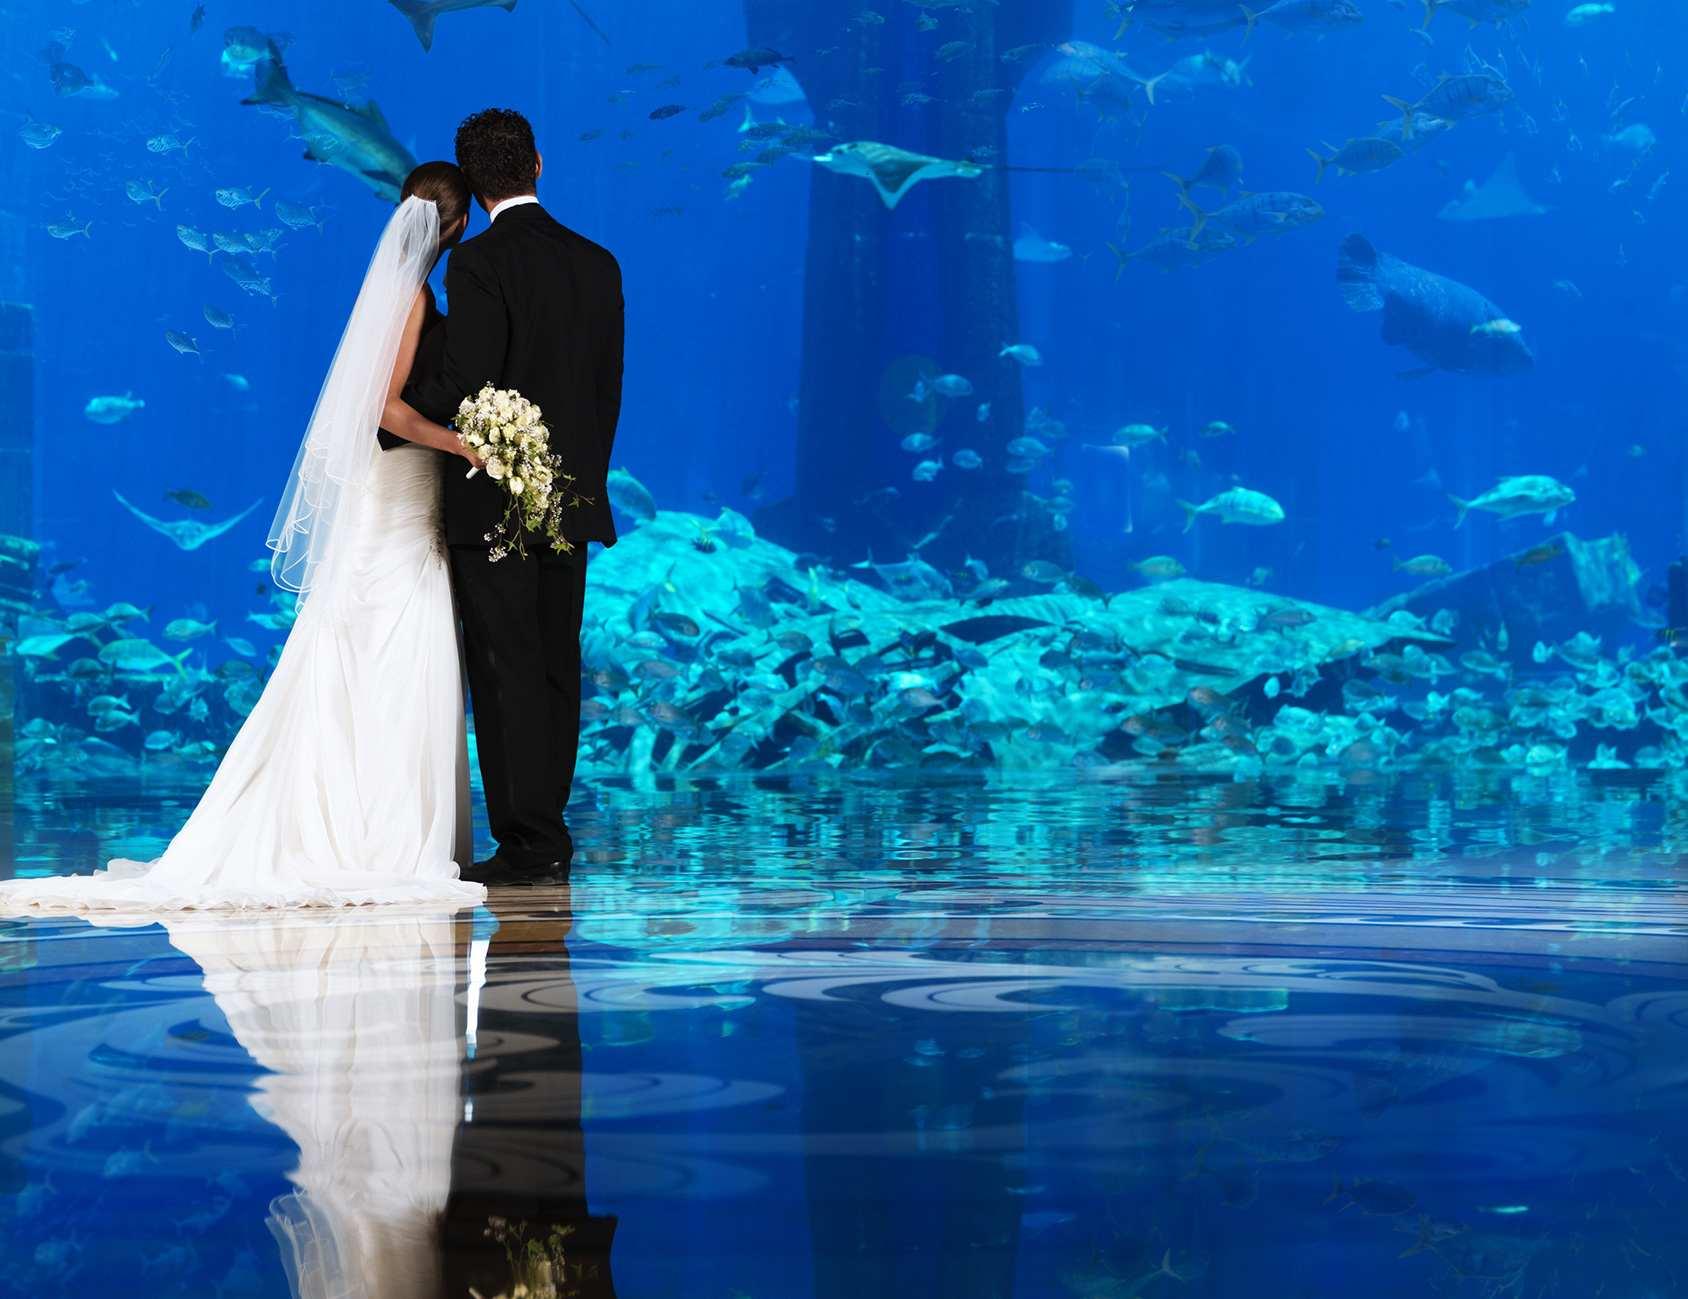 dubai atlantis palm hotel wedding underwater weddings destination ceremony congress bid wins host planning thailand restaurants donia